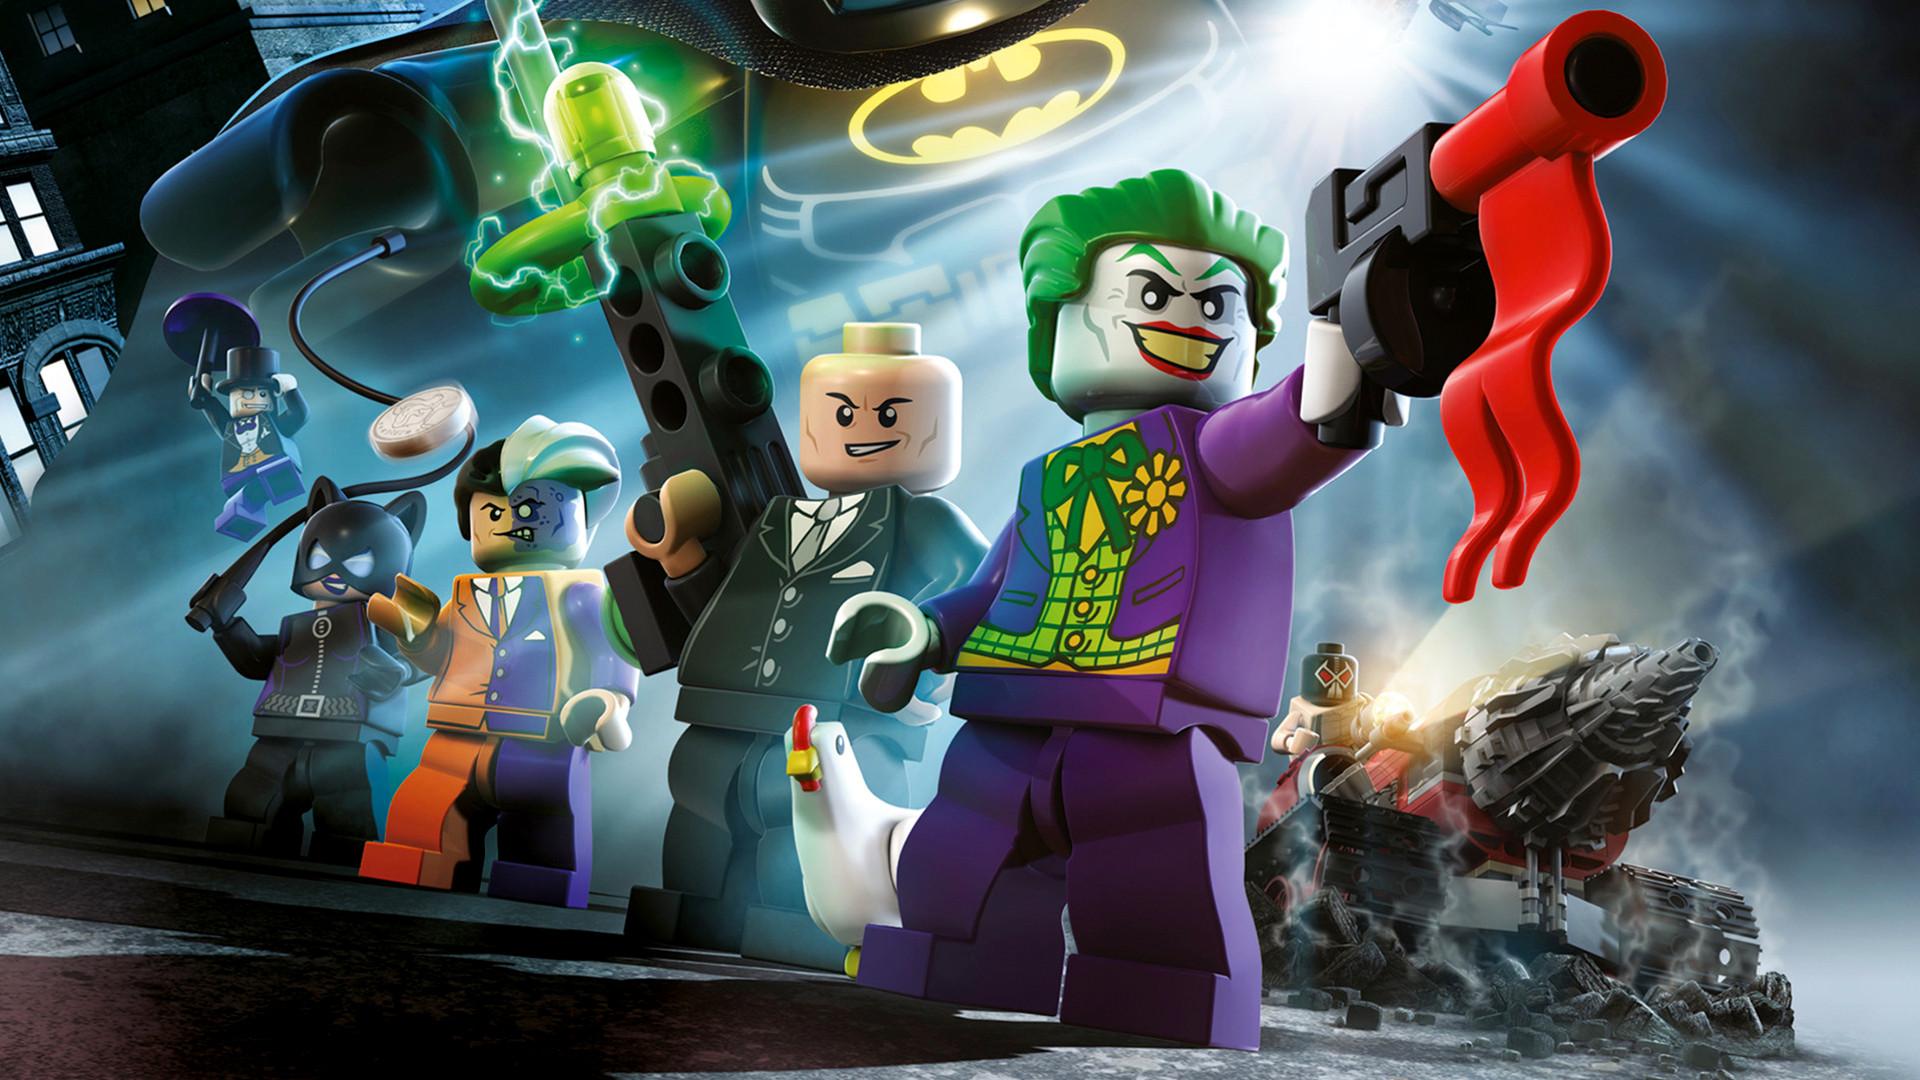 Batman Joker Quotes Mobile Wallpaper The Lego Batman Joker Army Hd Movies 4k Wallpapers